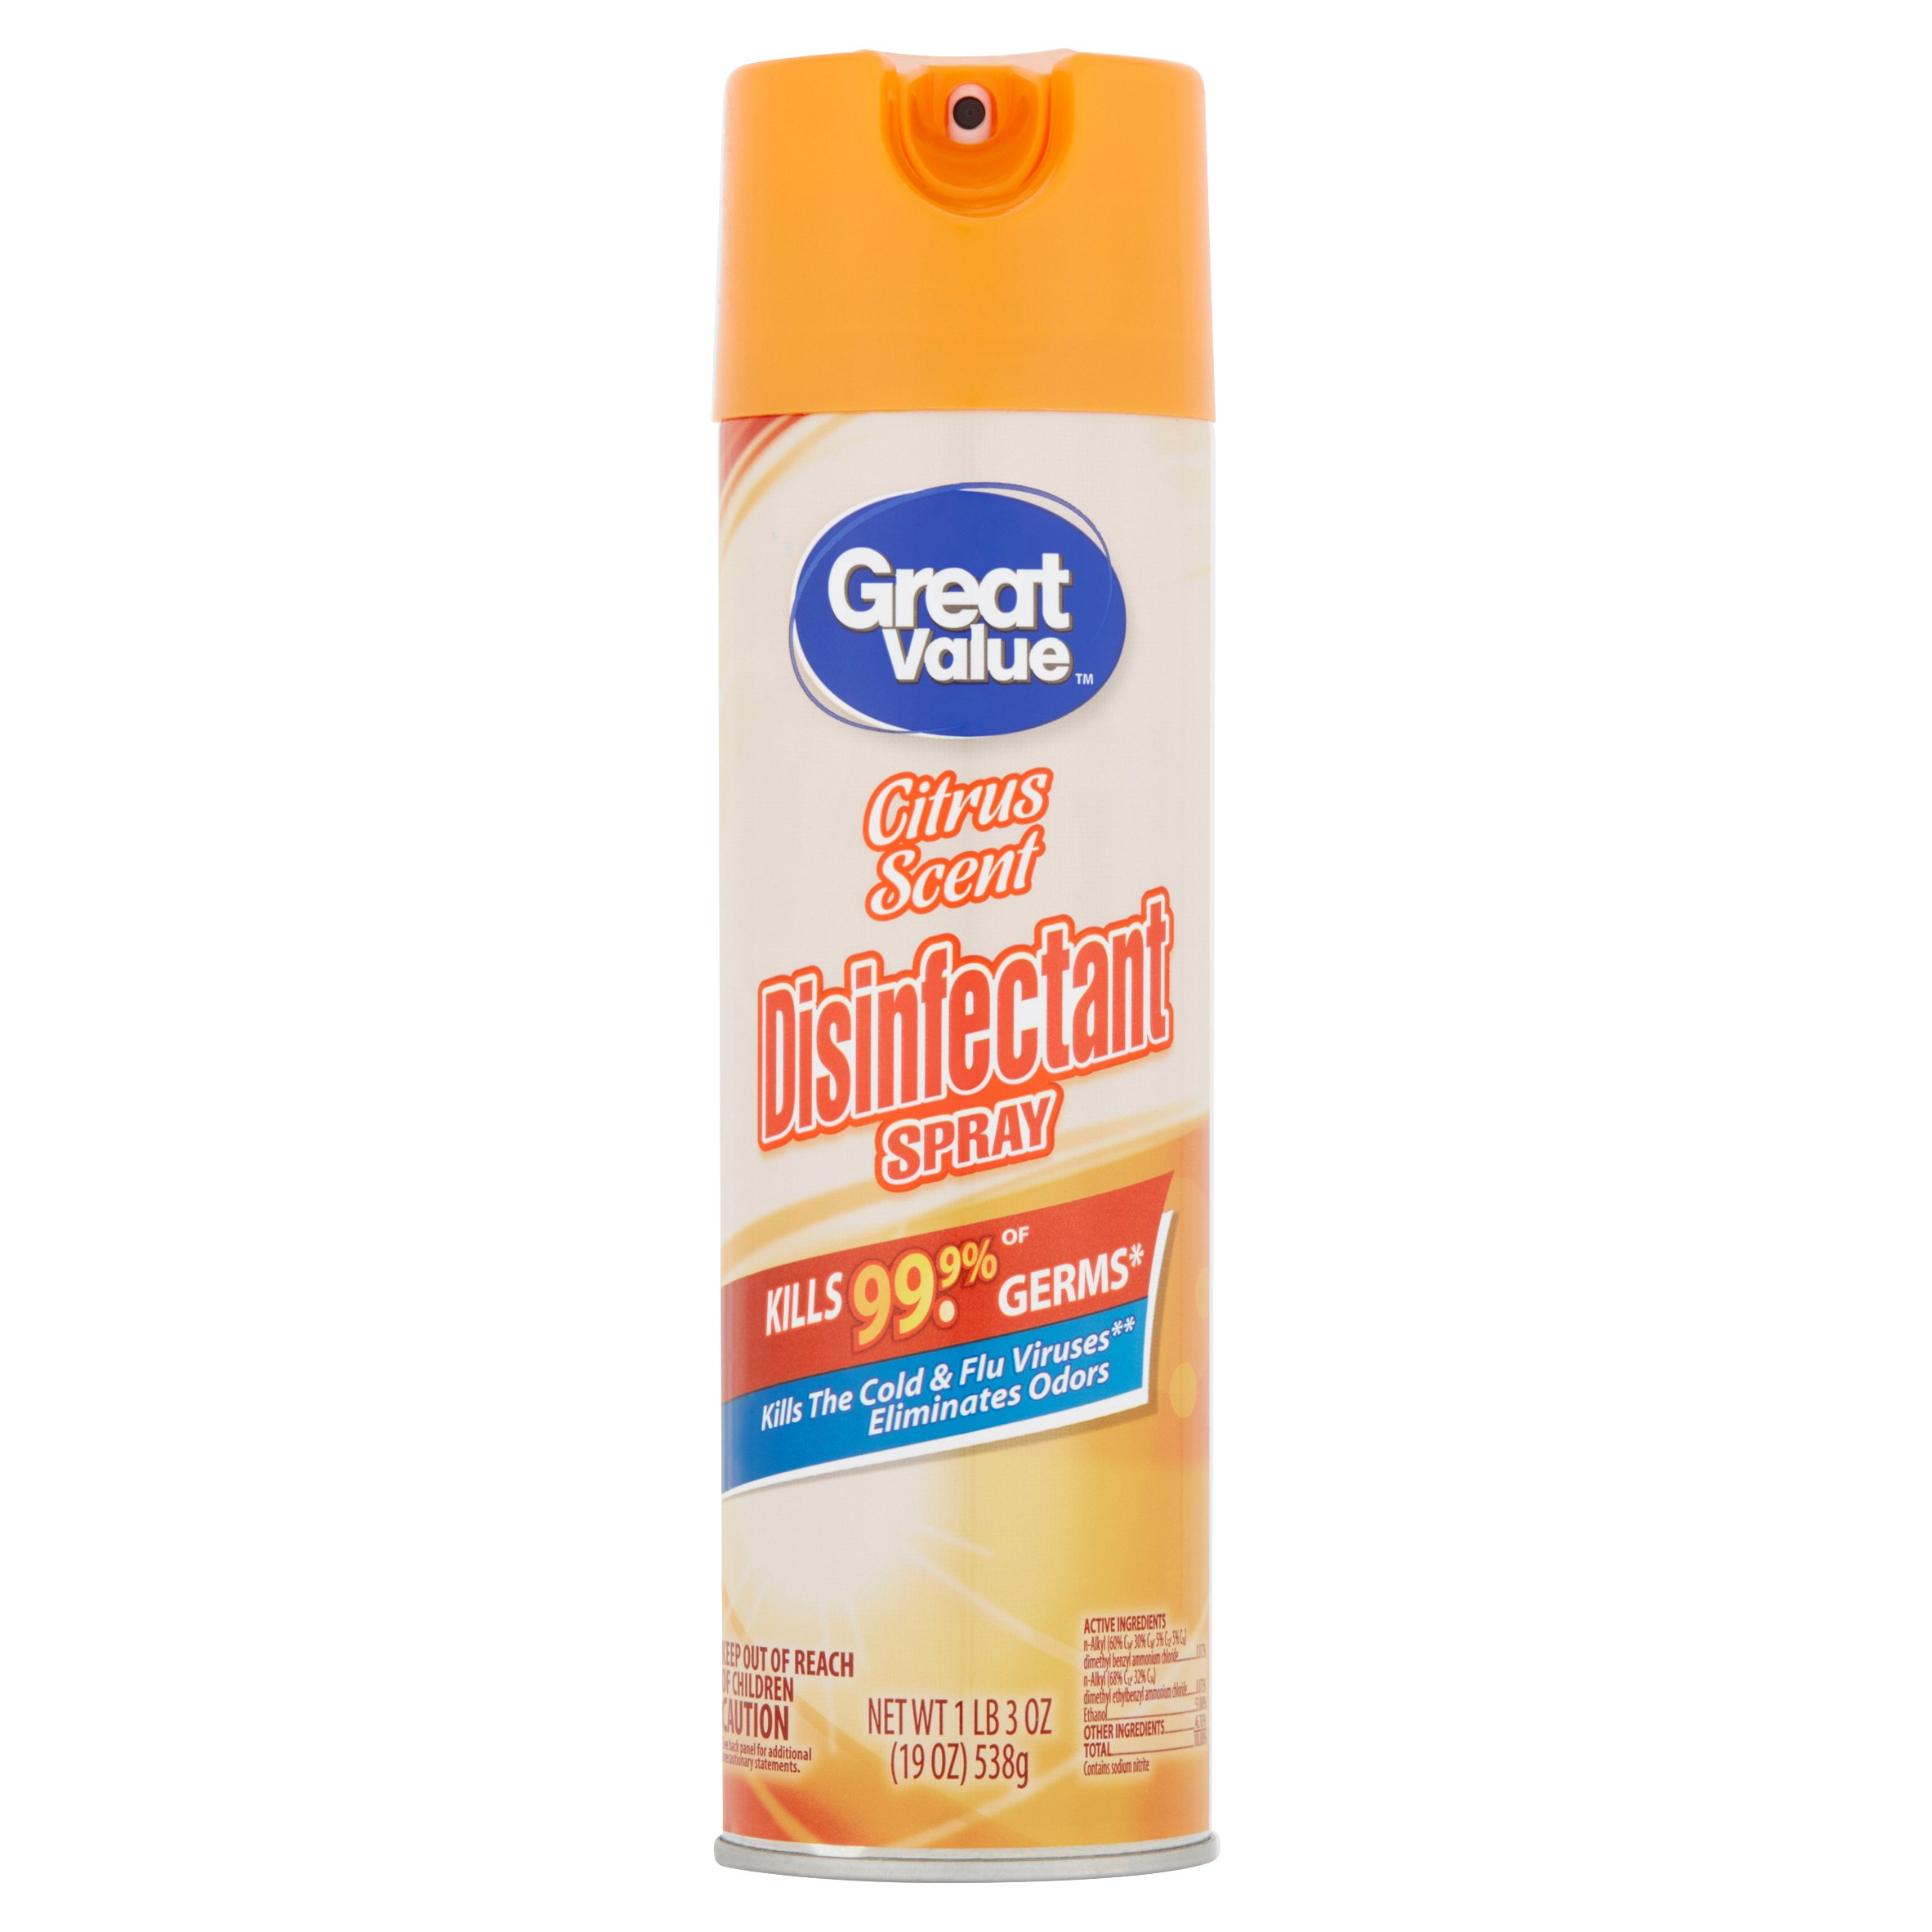 Great Value Citrus Scent Disinfectant Spray, 19 oz